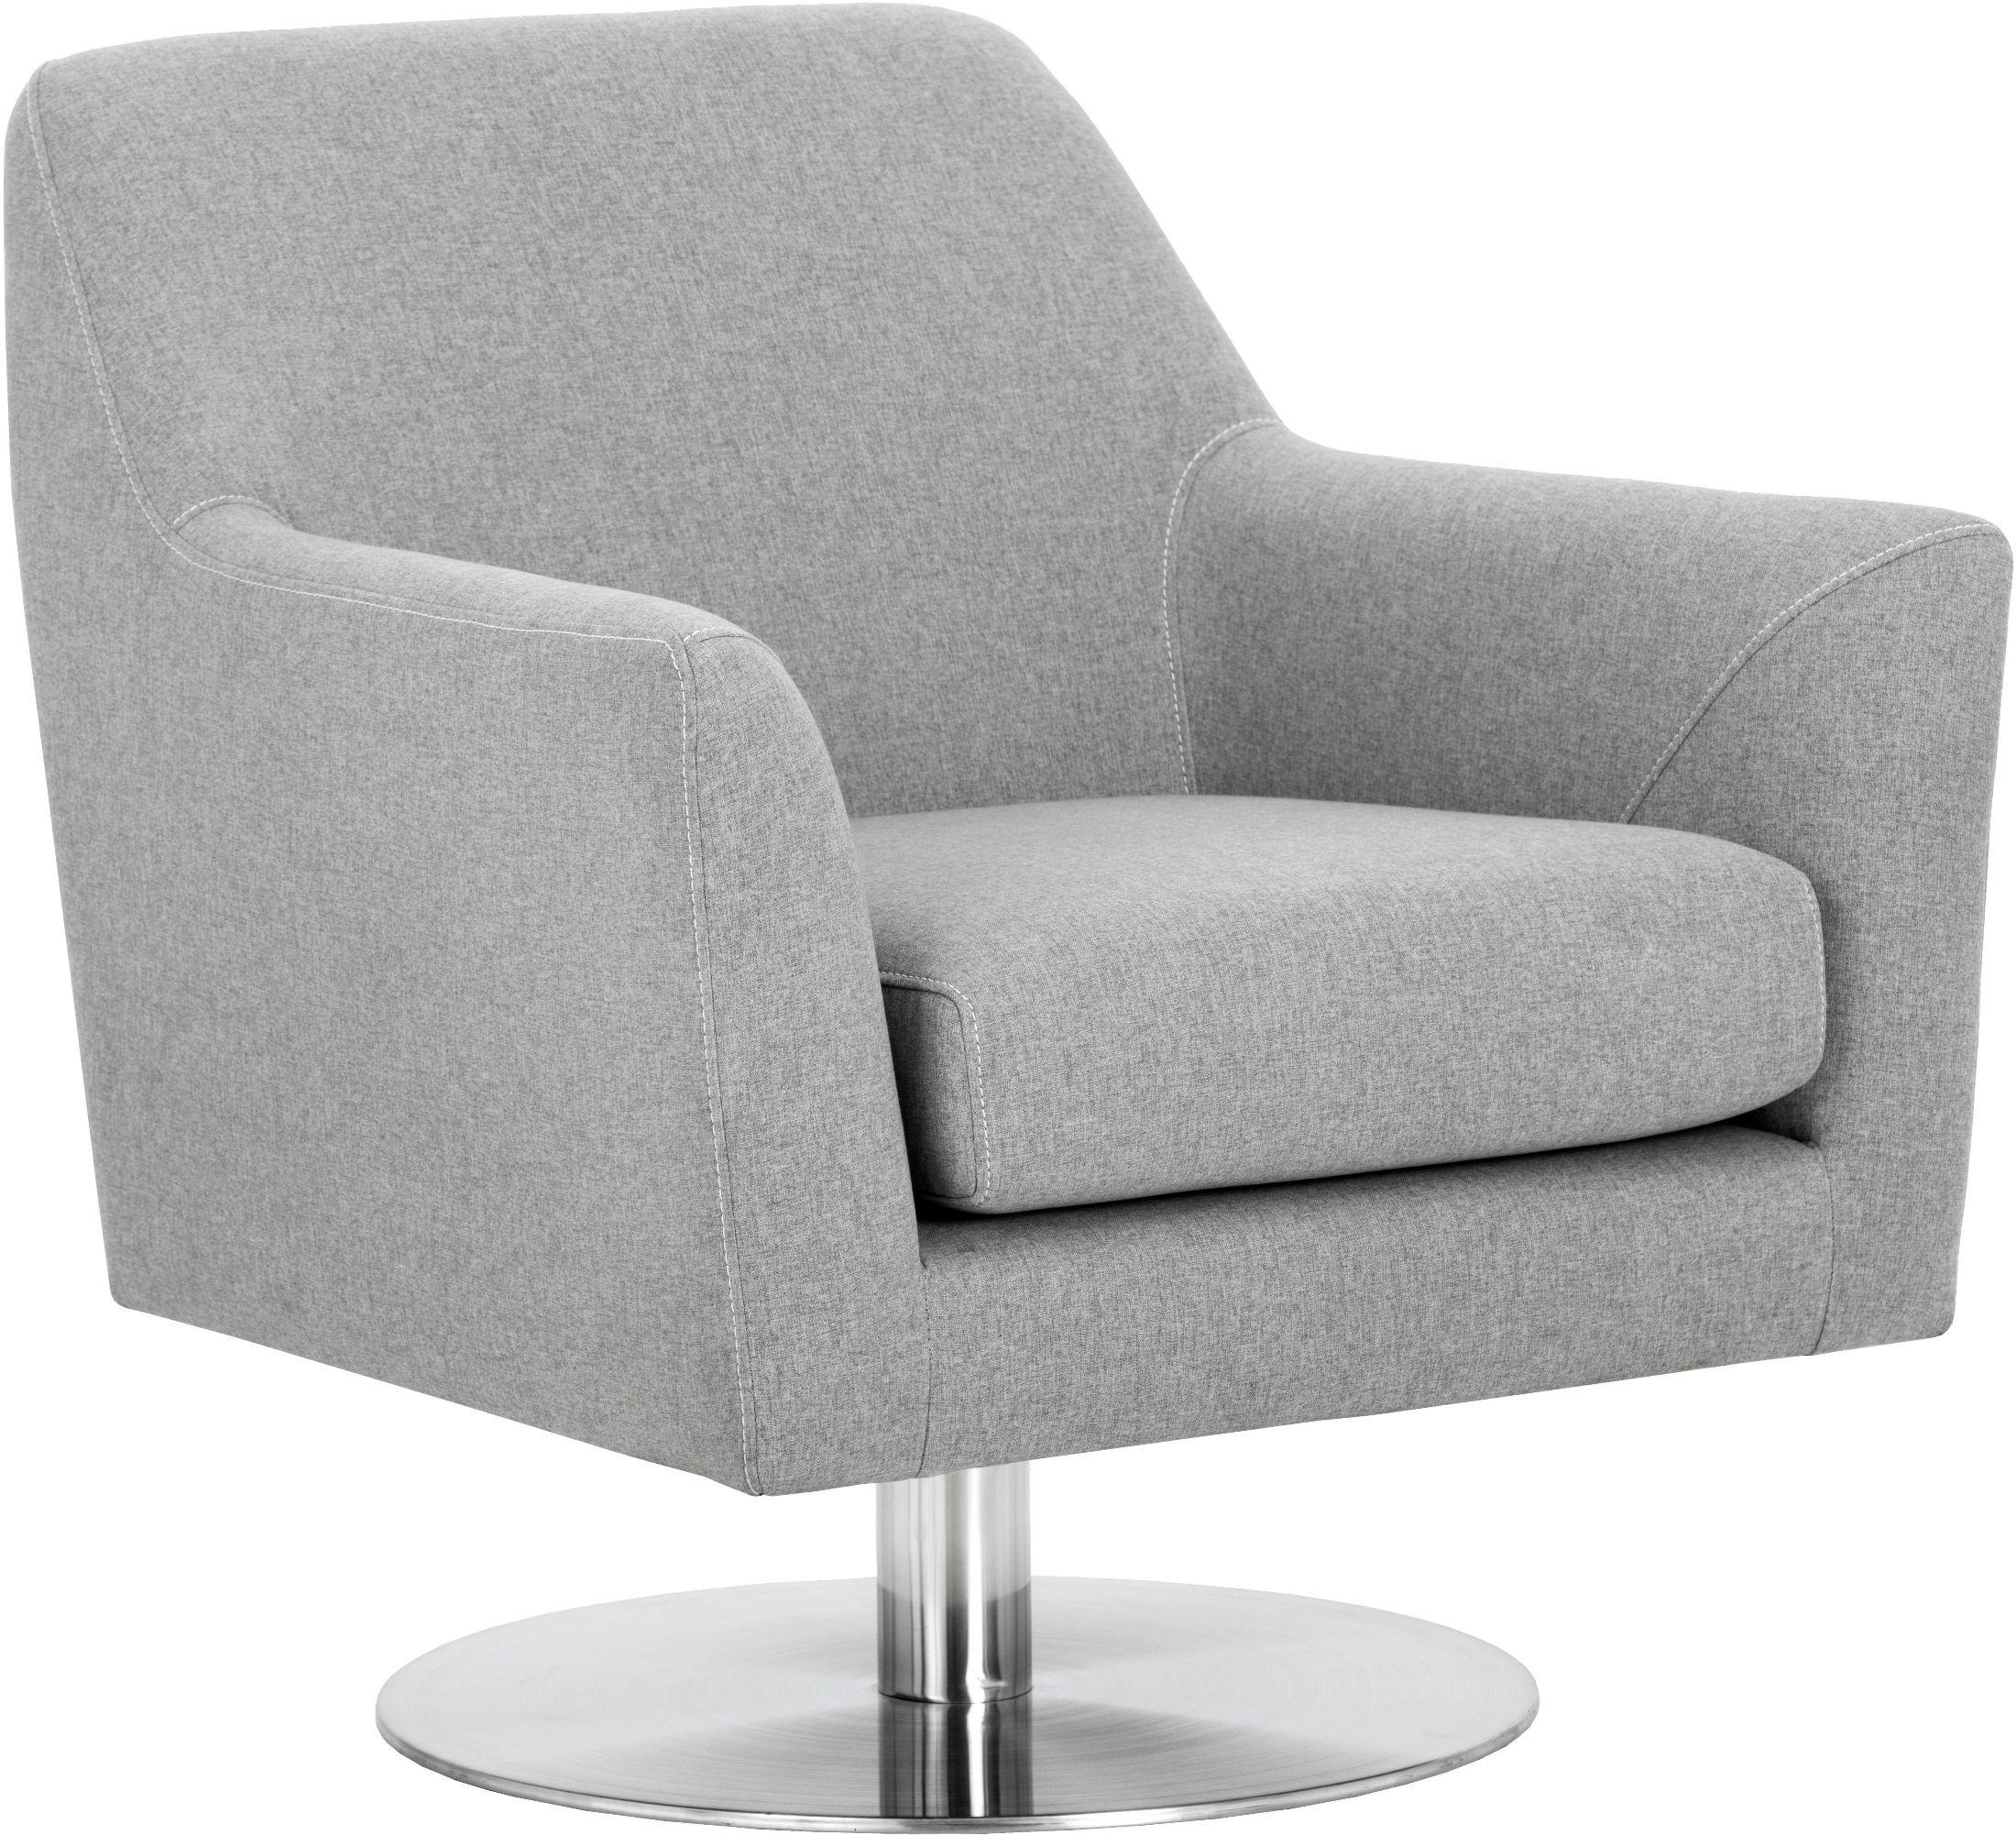 Doris Monday Grey Upholstered Swivel Chair from Sunpan